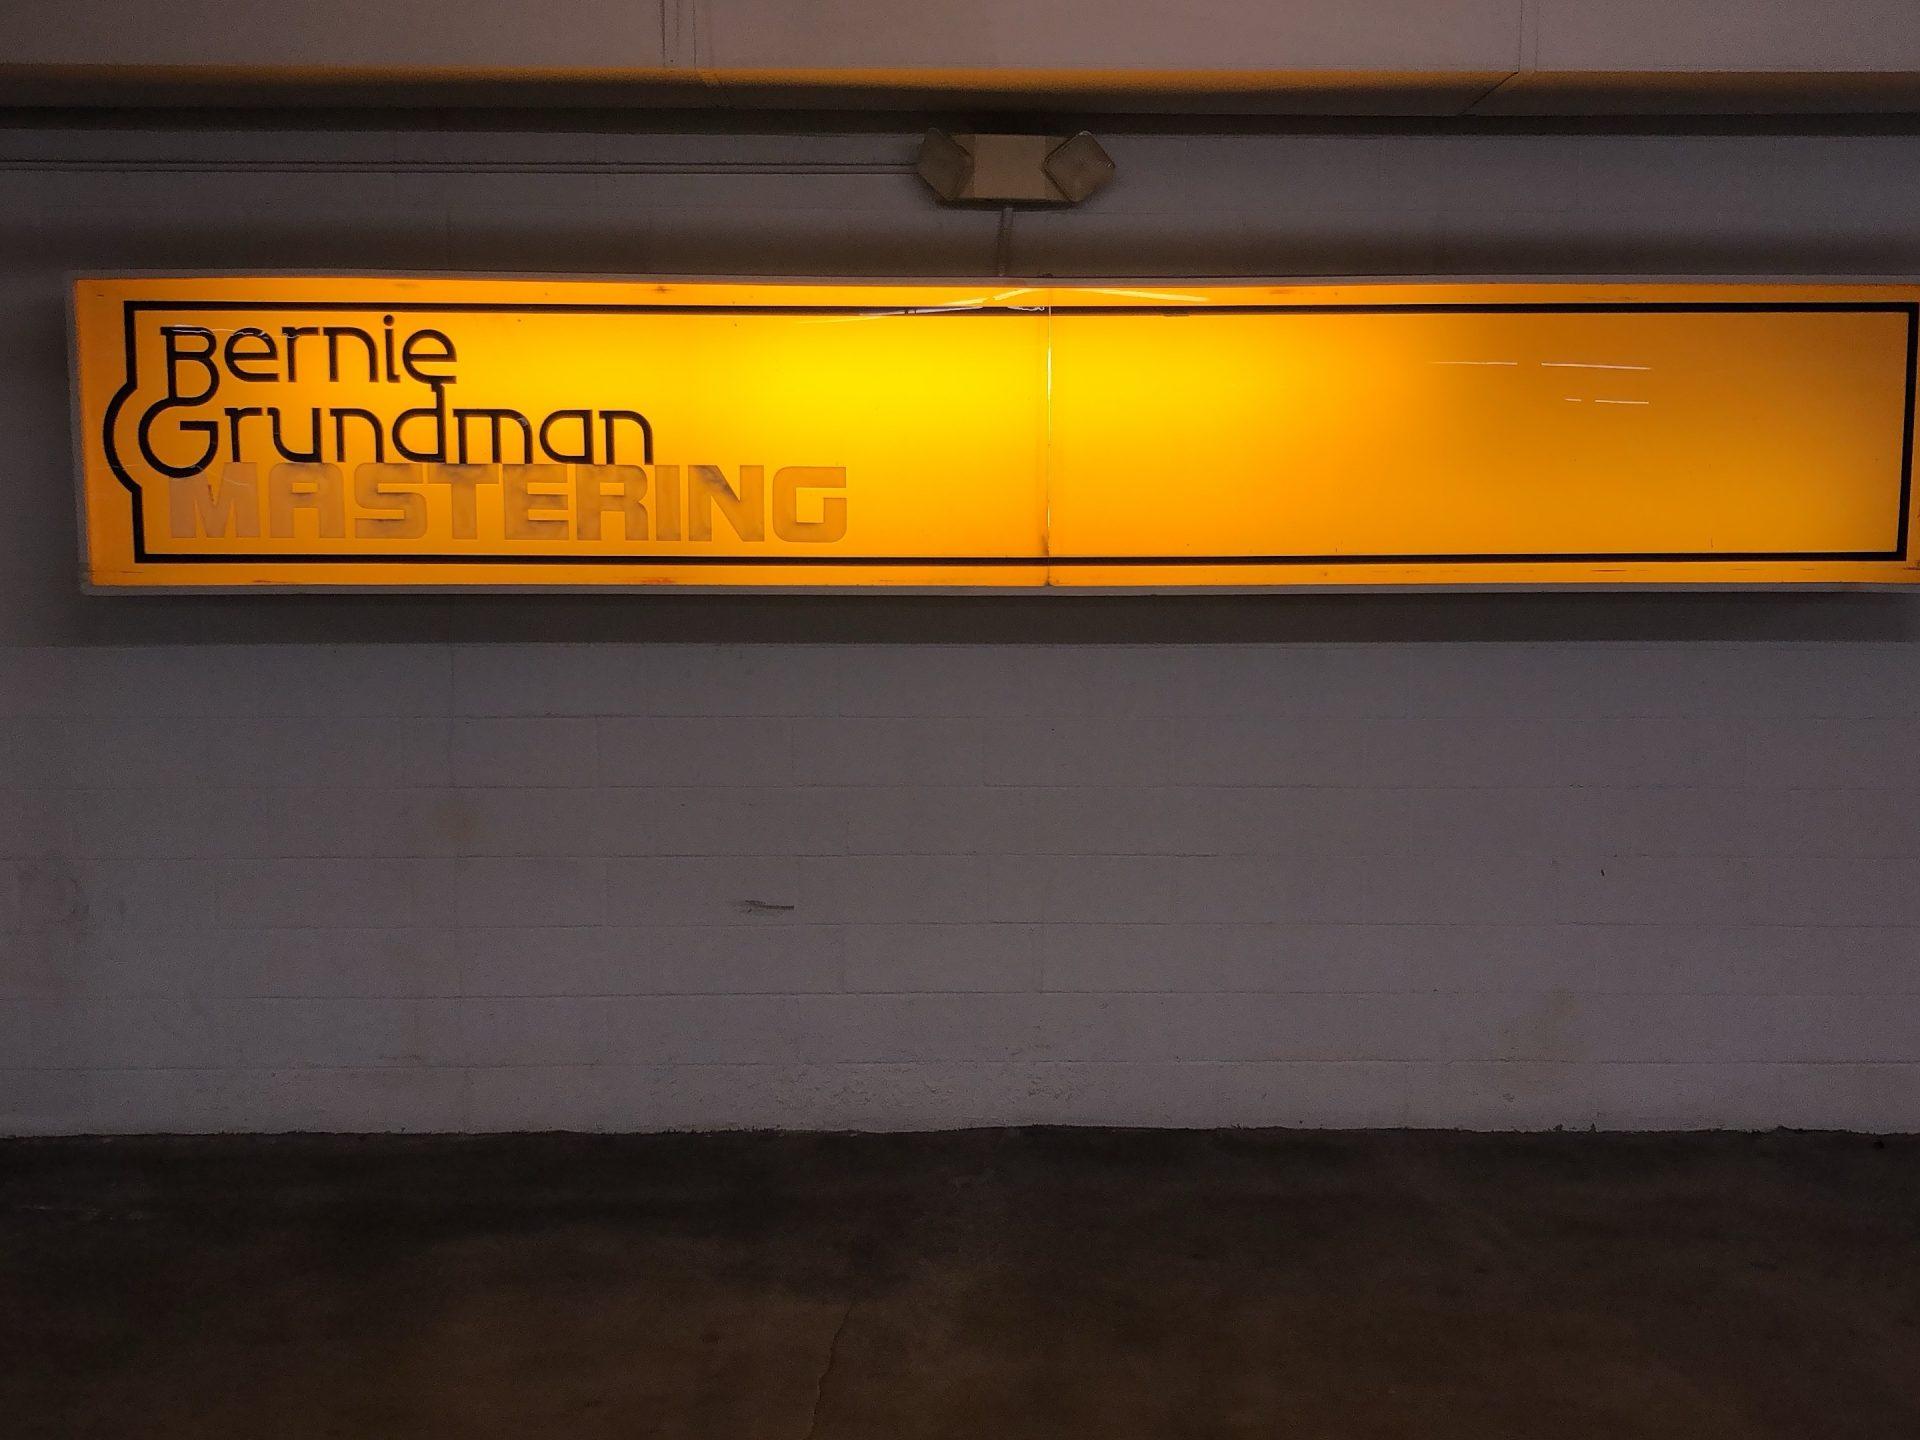 Bernie Grundman Mastering Cam O'bi Singles